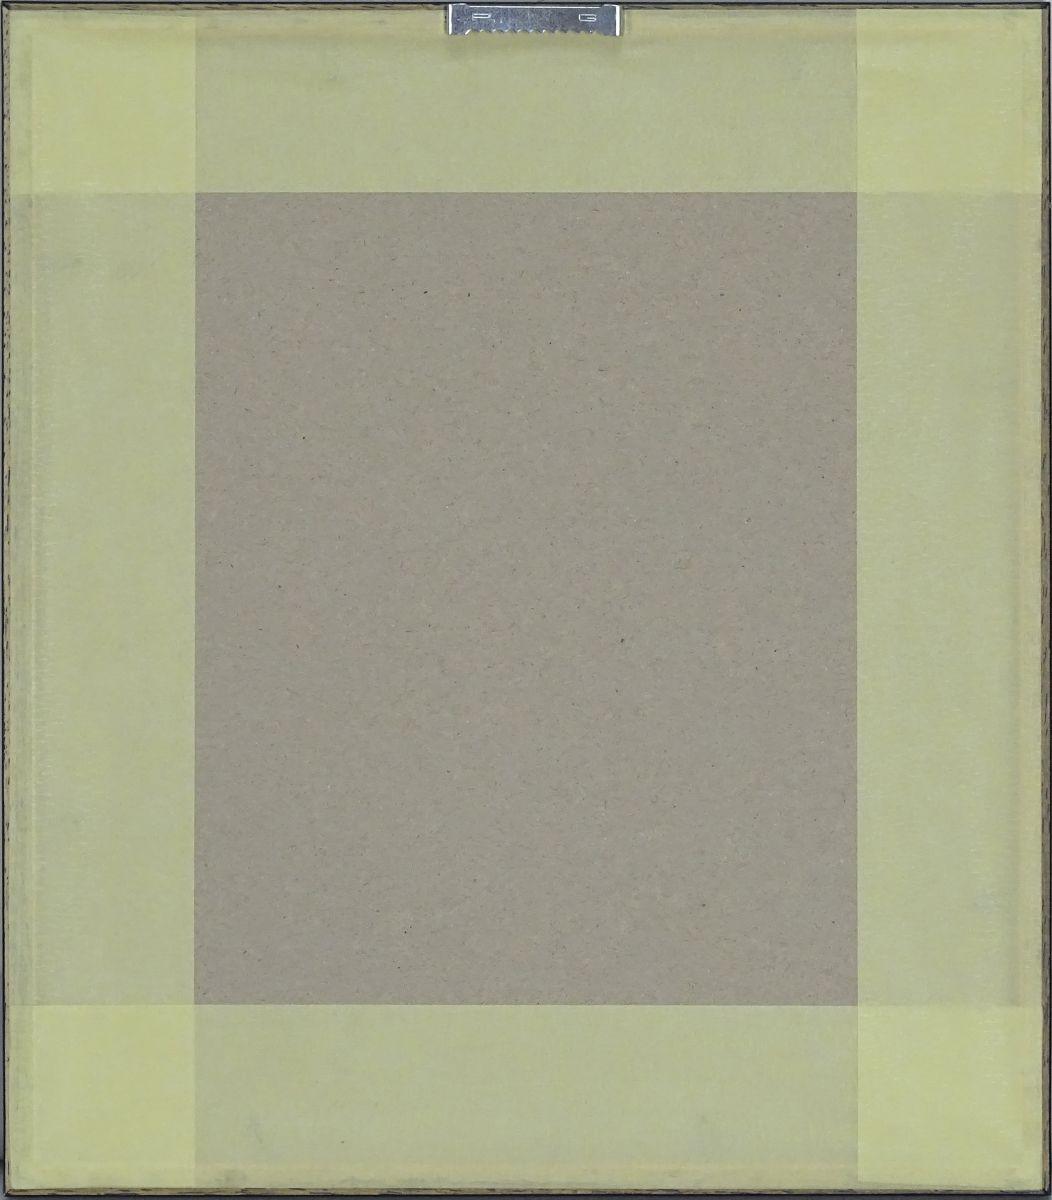 DSC03606.JPG (1052×1200)